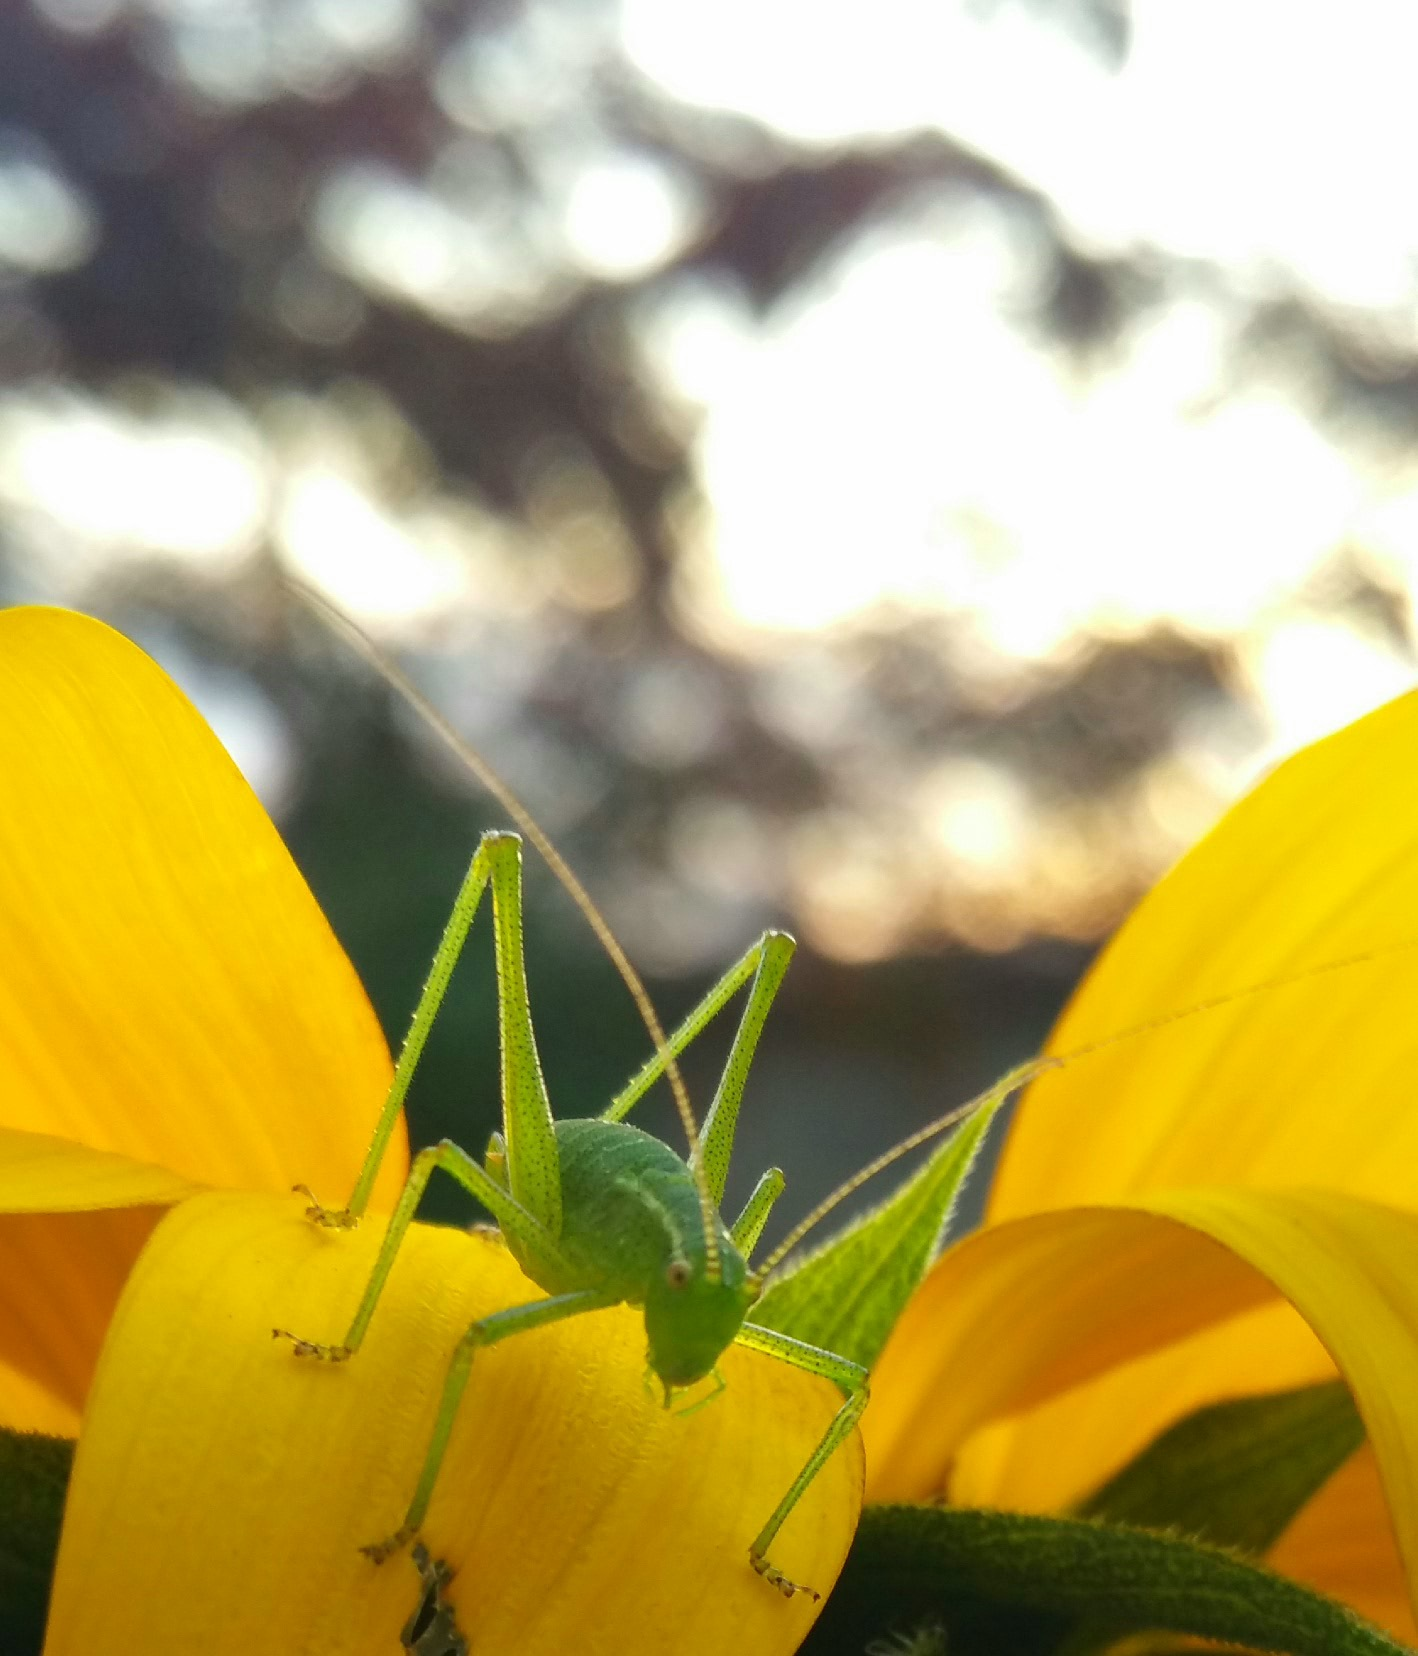 Grasshopper on a sunflower by StudioAnjaPhotography